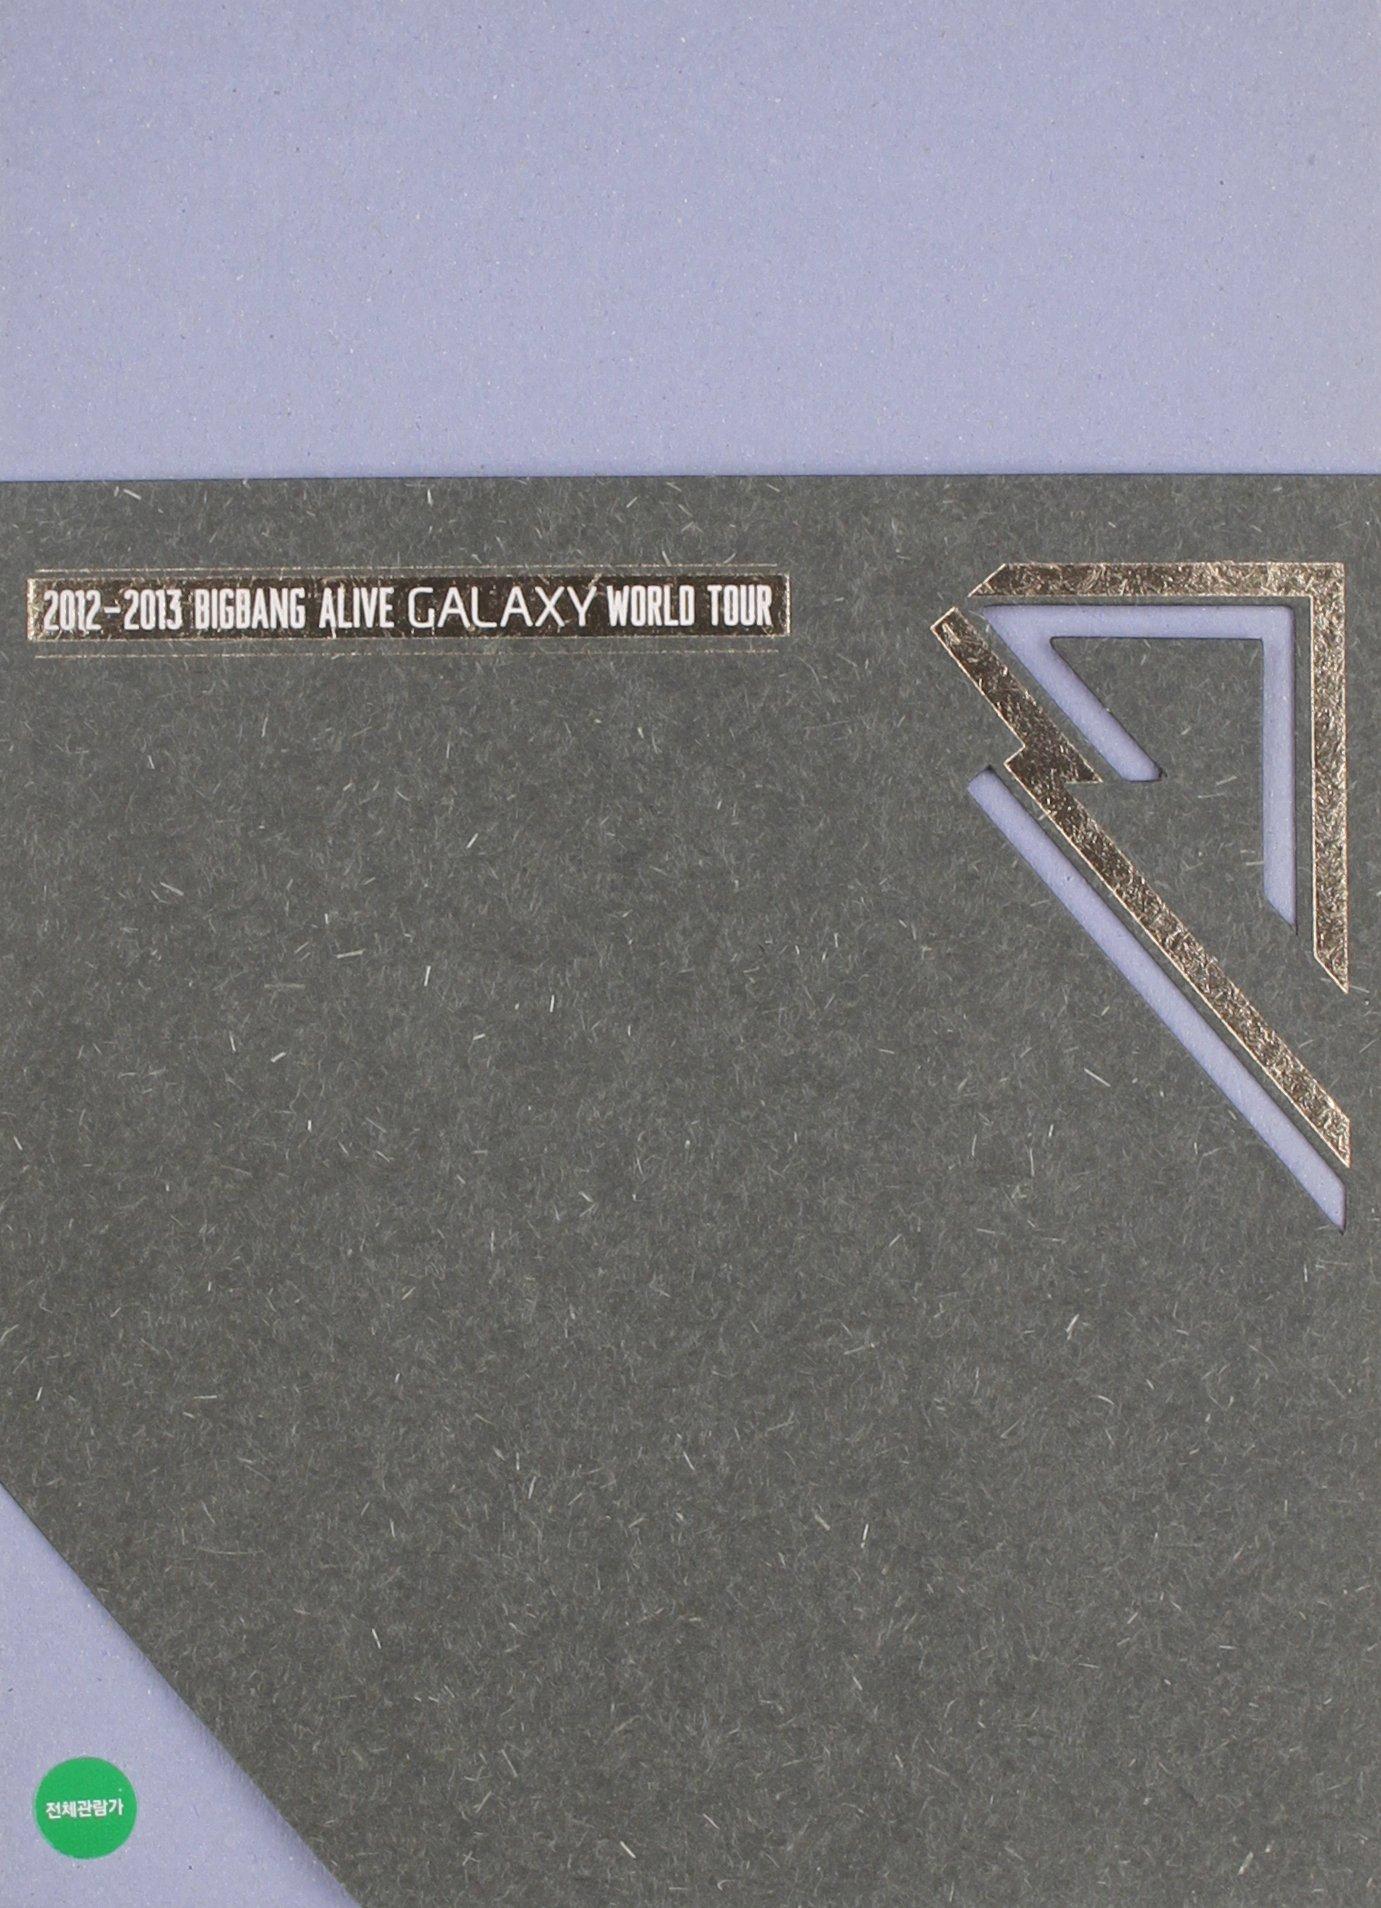 DVD : Bigbang - Alive Galaxy World Tour 2012 - 2013 (3 Disc)